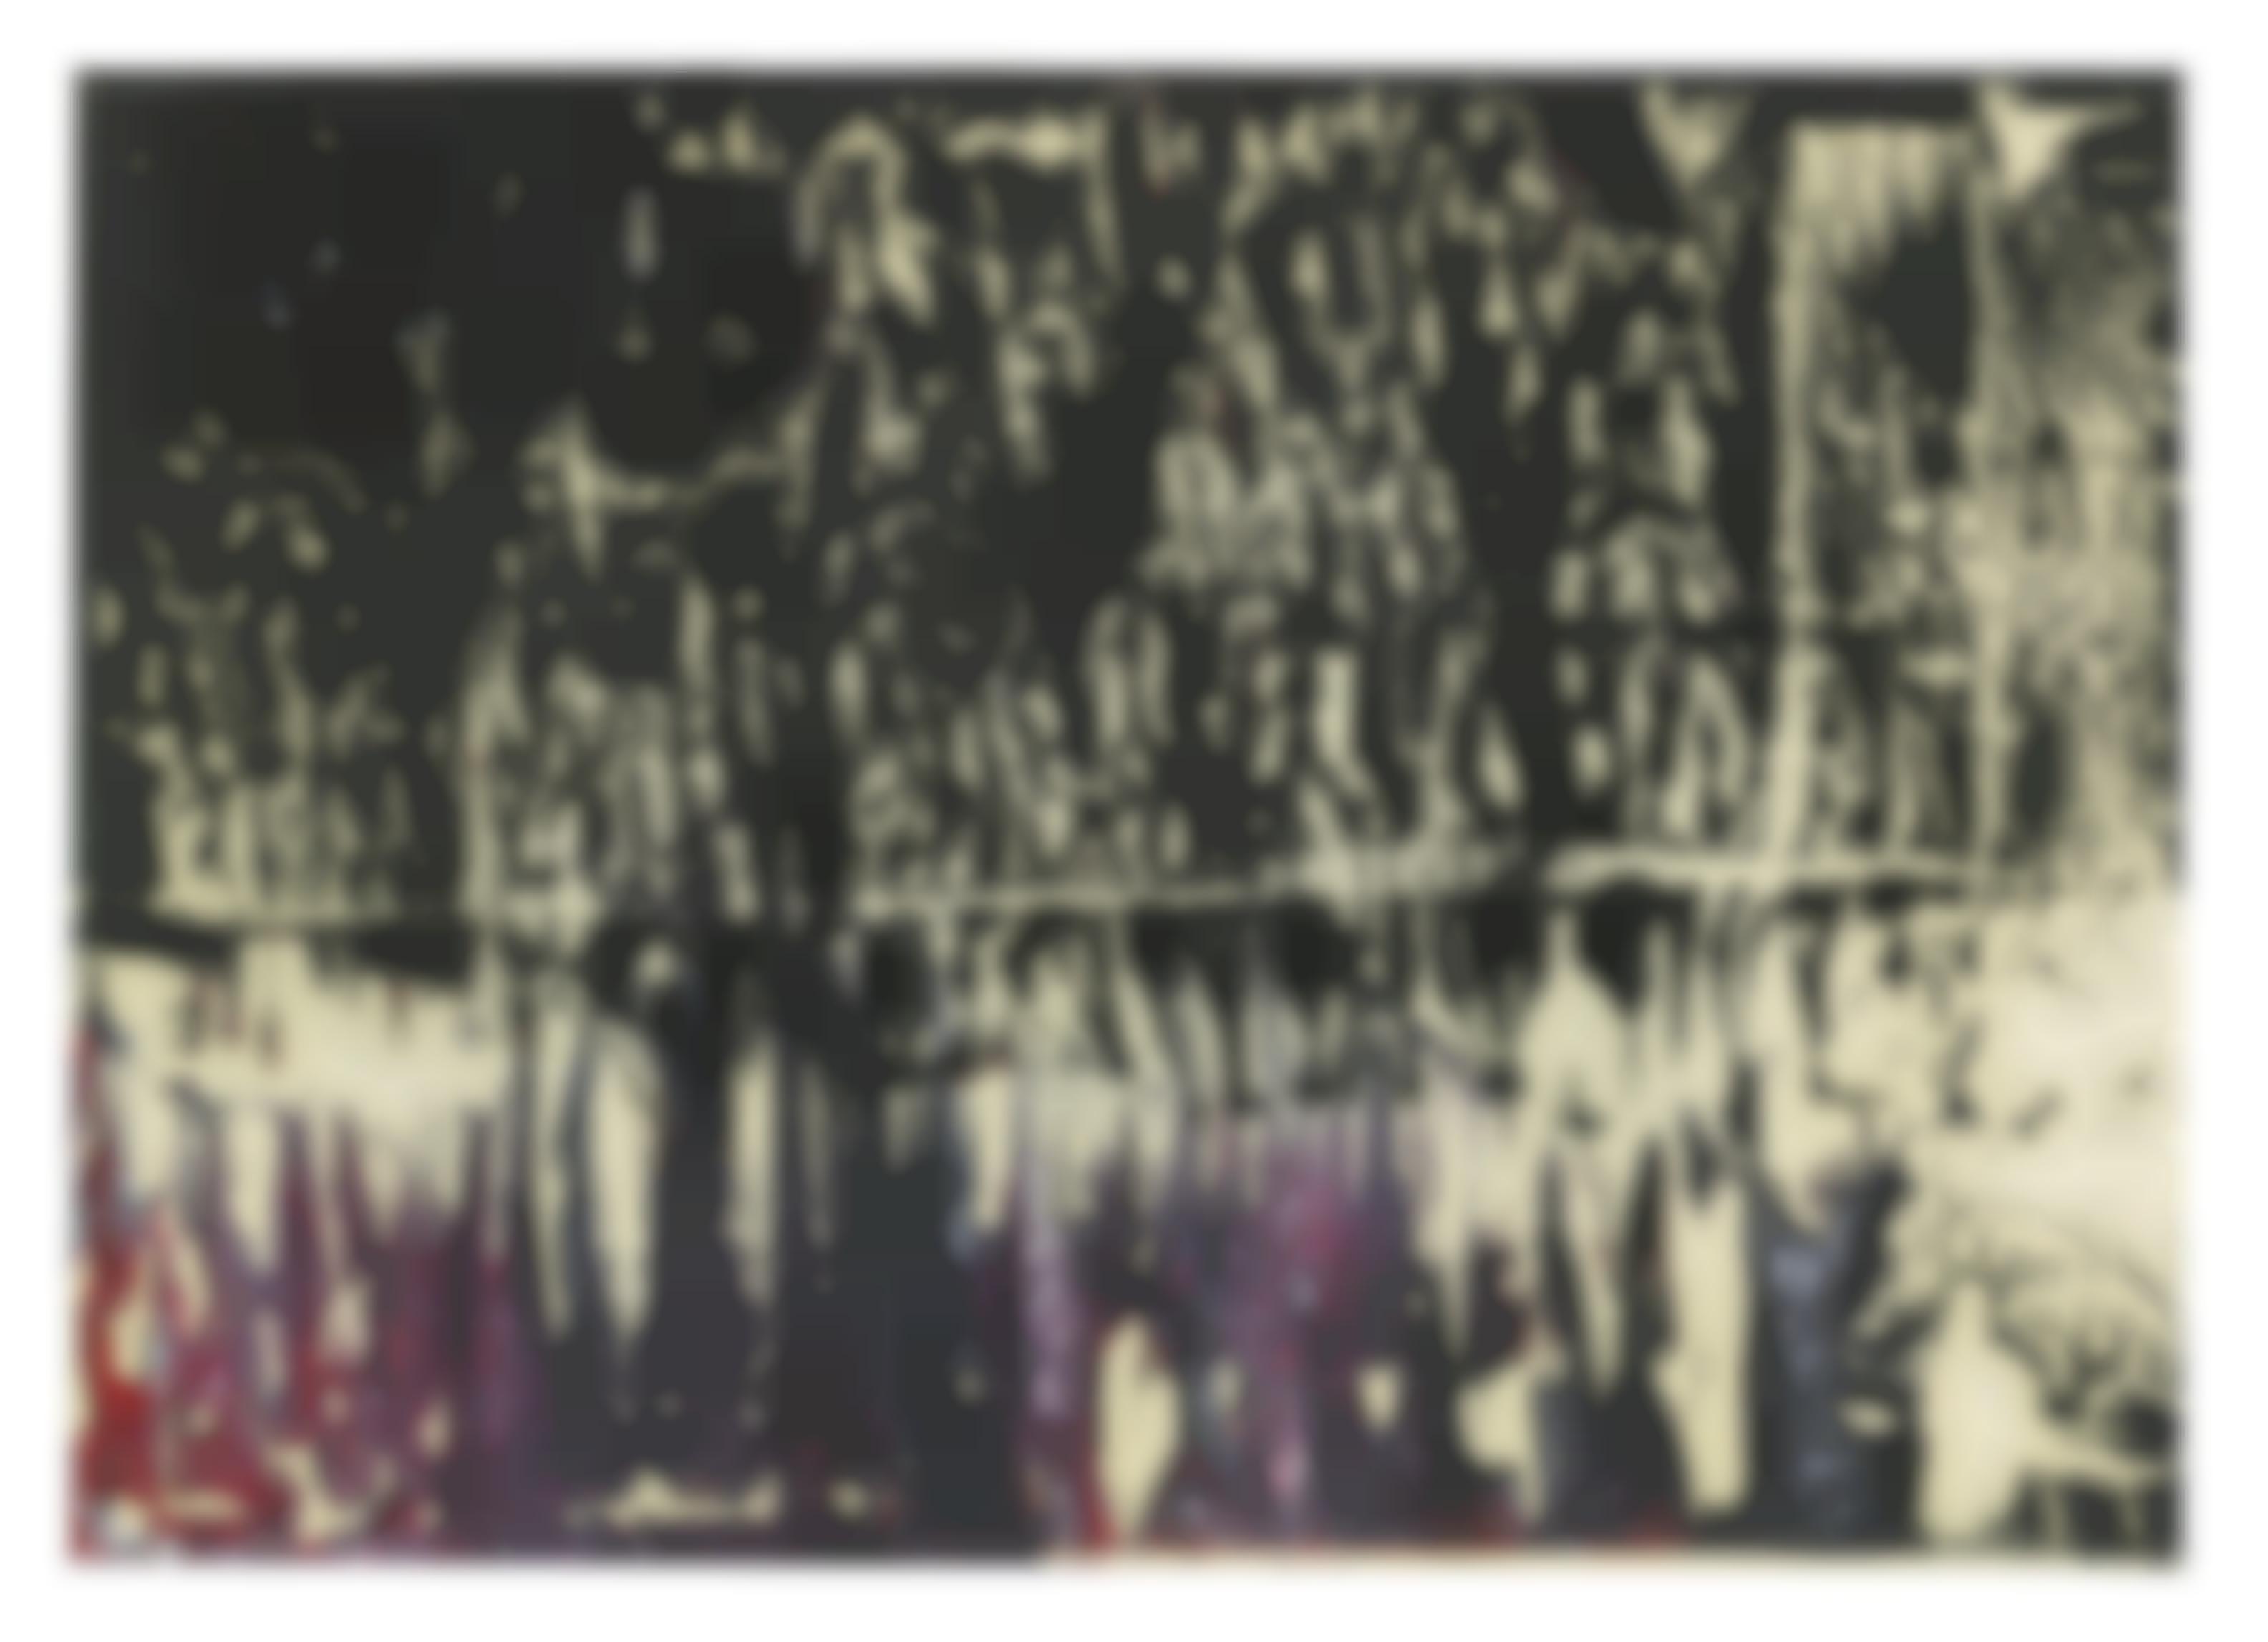 Gerhard Richter-10.4.89-1989